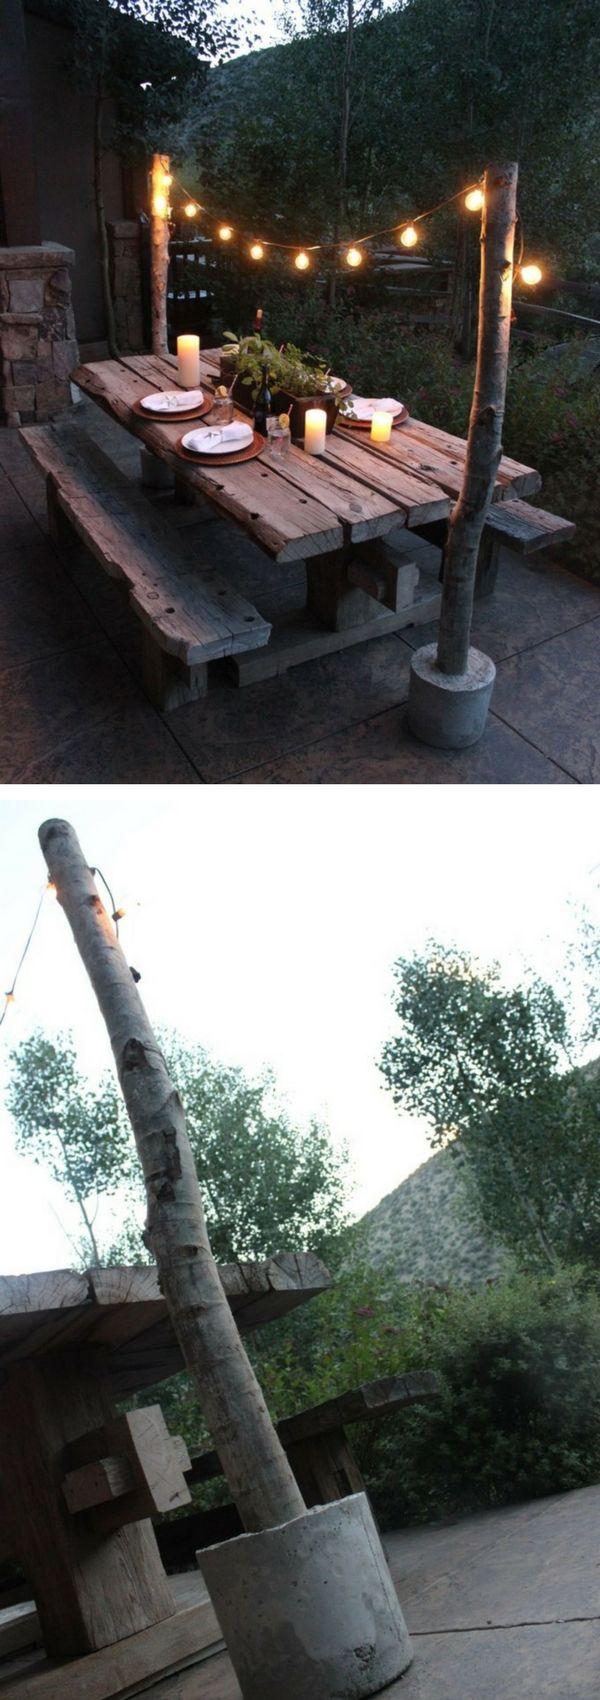 15 easy and creative diy outdoor lighting ideas outdoor string